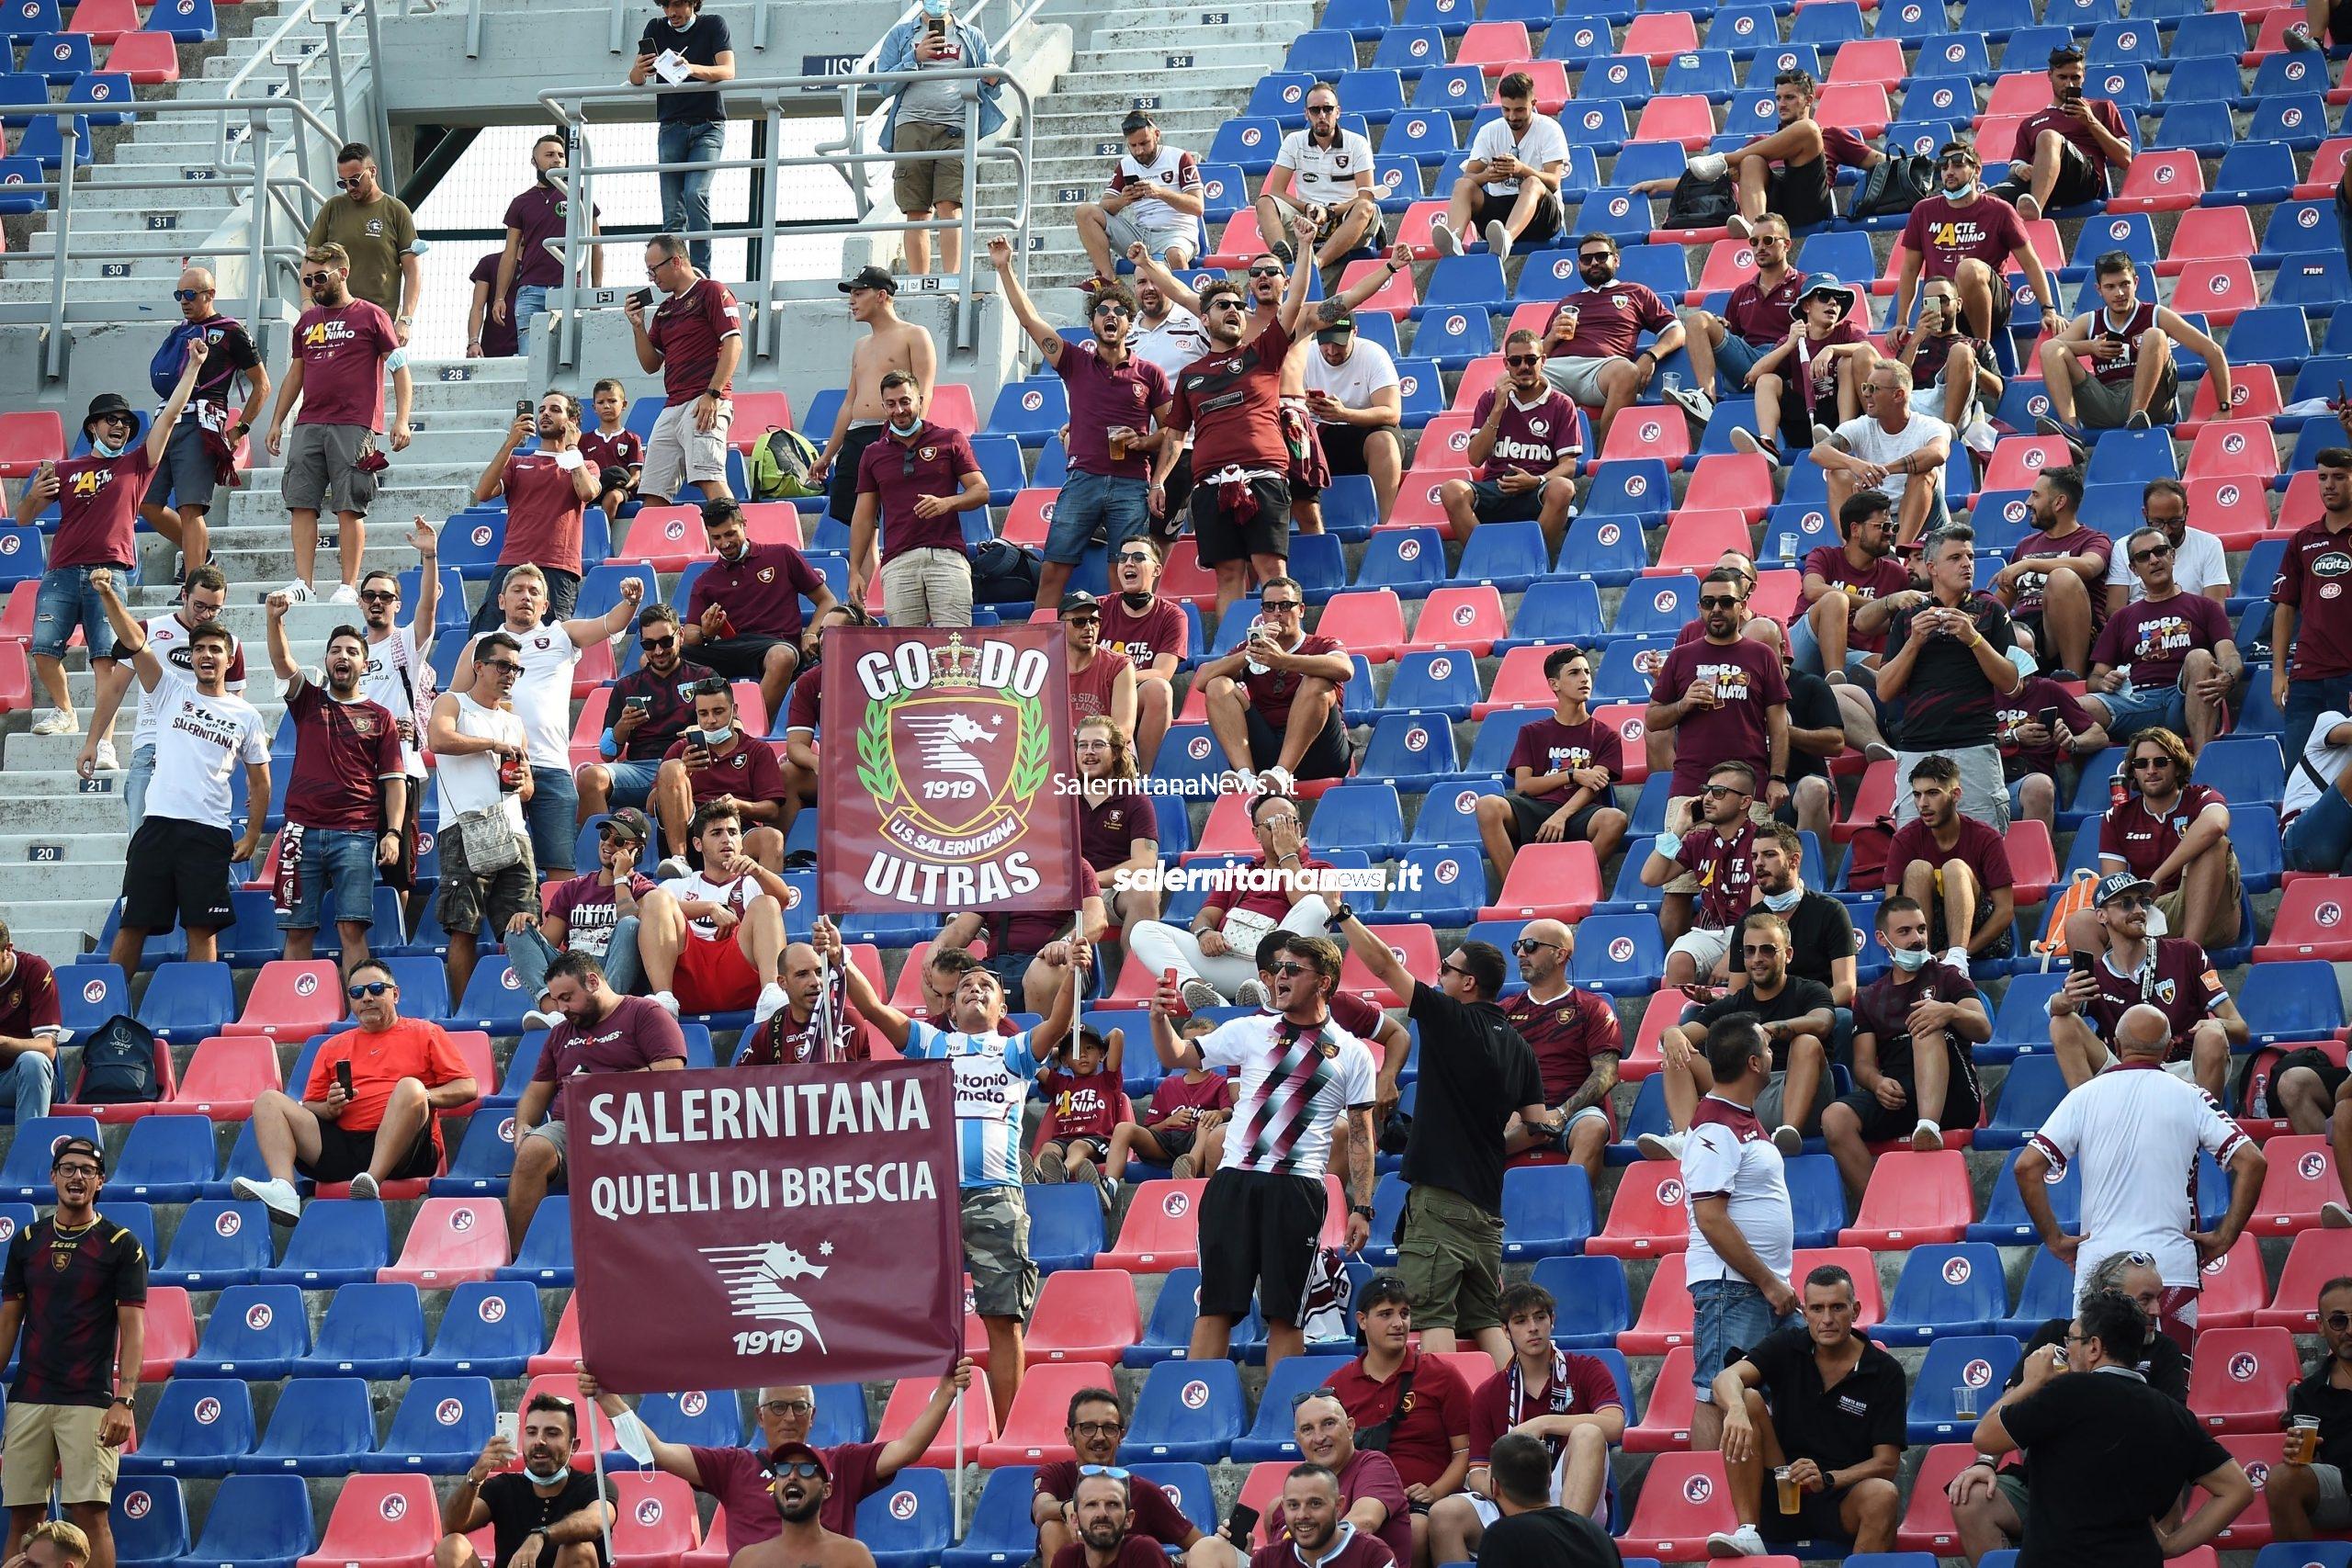 Sal – 22 agosto 2021 Bologna – Salernitana campionato serie A 2021/2022.